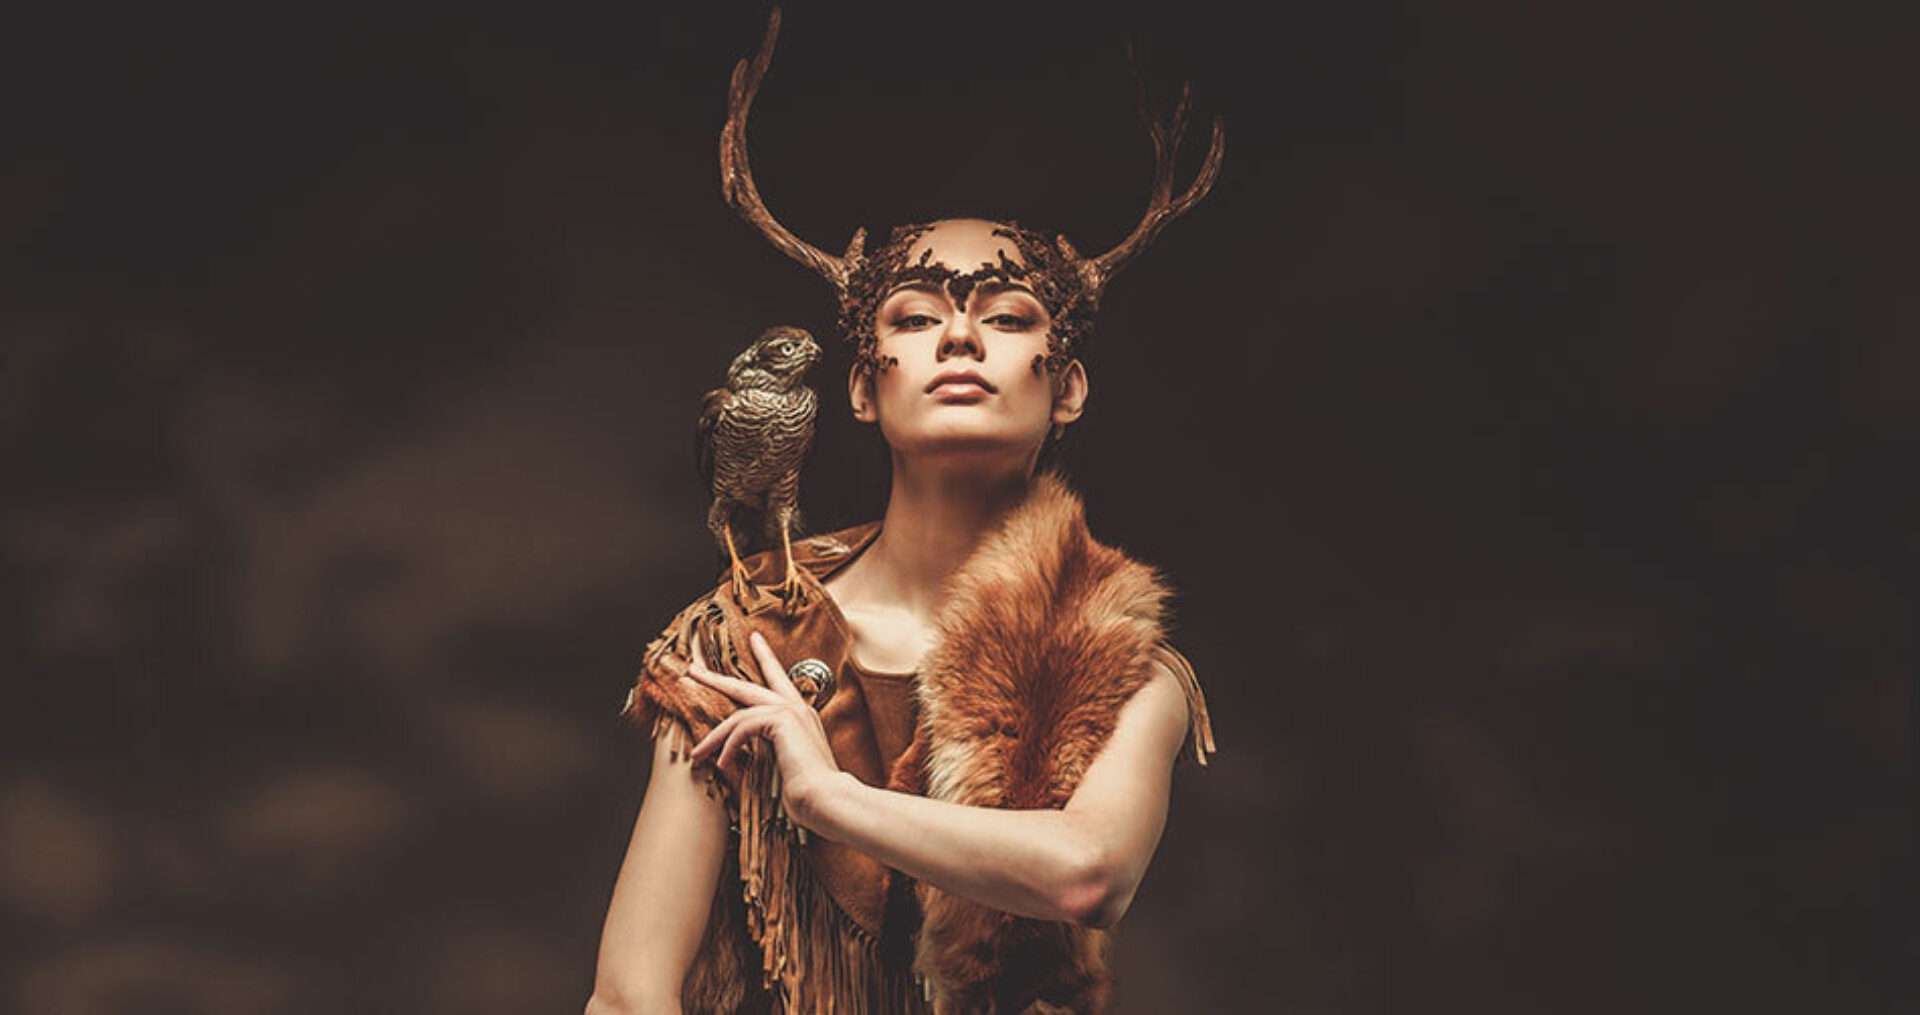 PODCAST: Sjamanisme februari ritueel - begeleiding